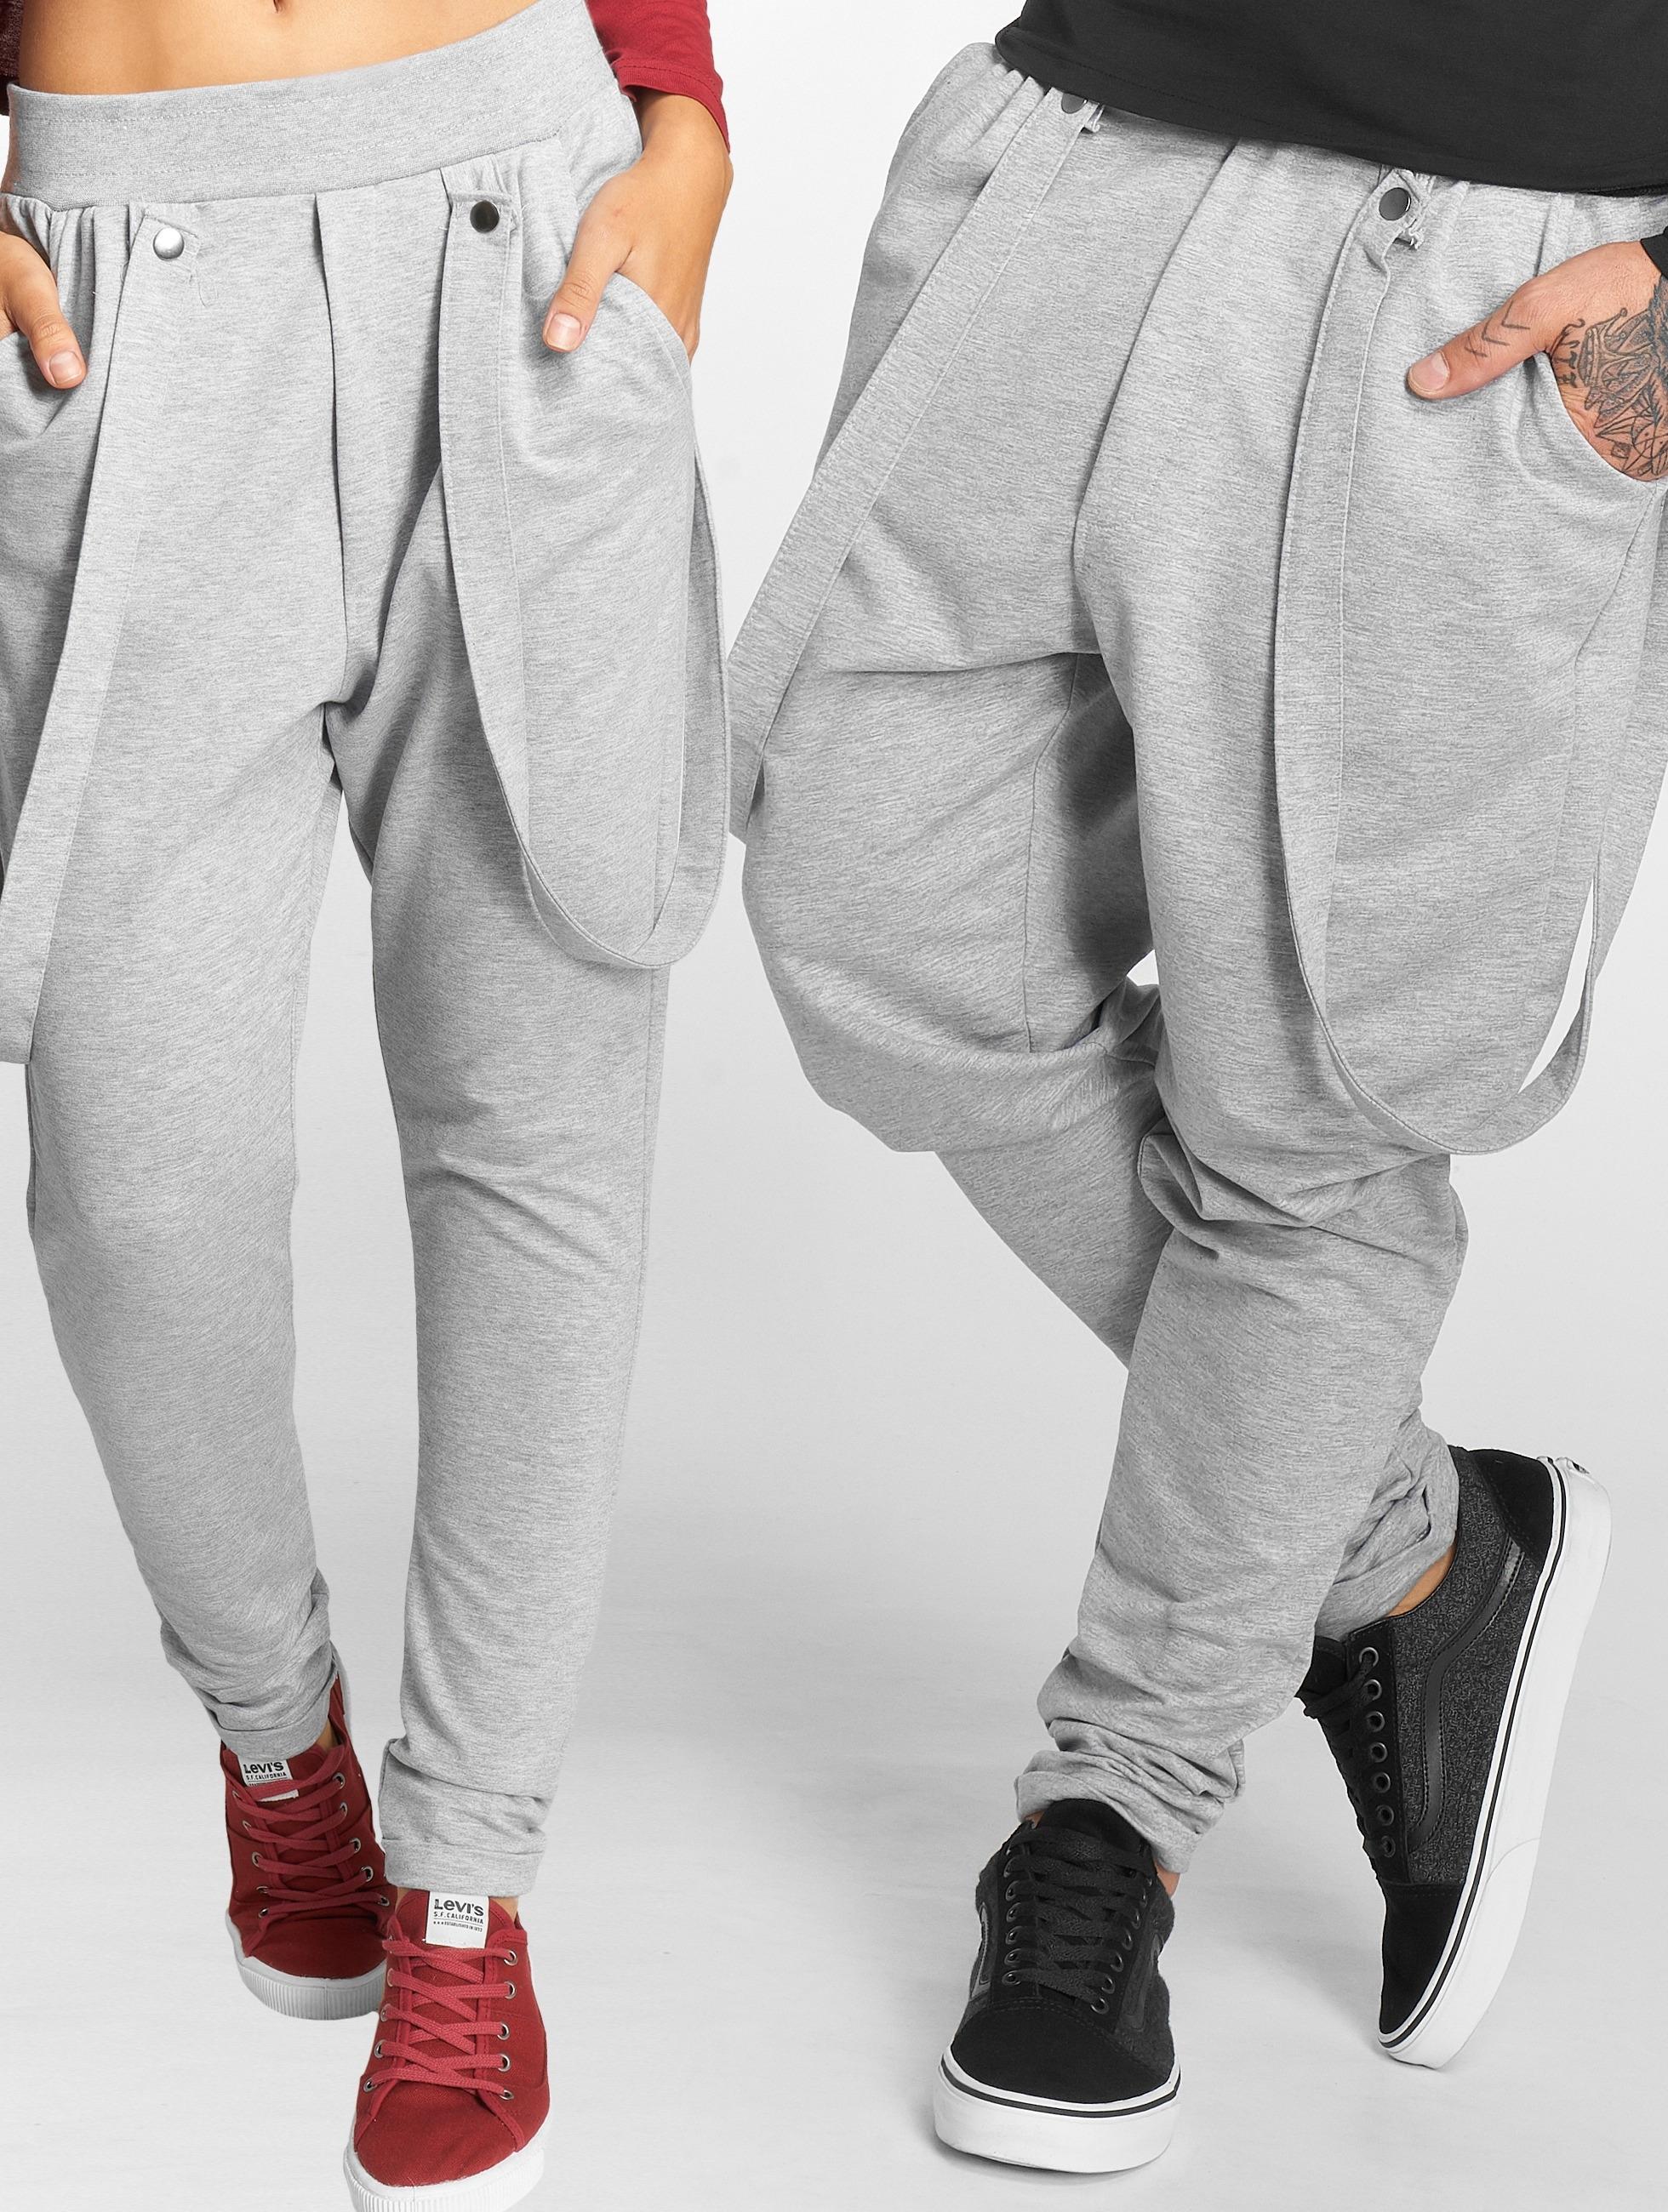 Bangastic / Sweat Pant Caro in grey XL